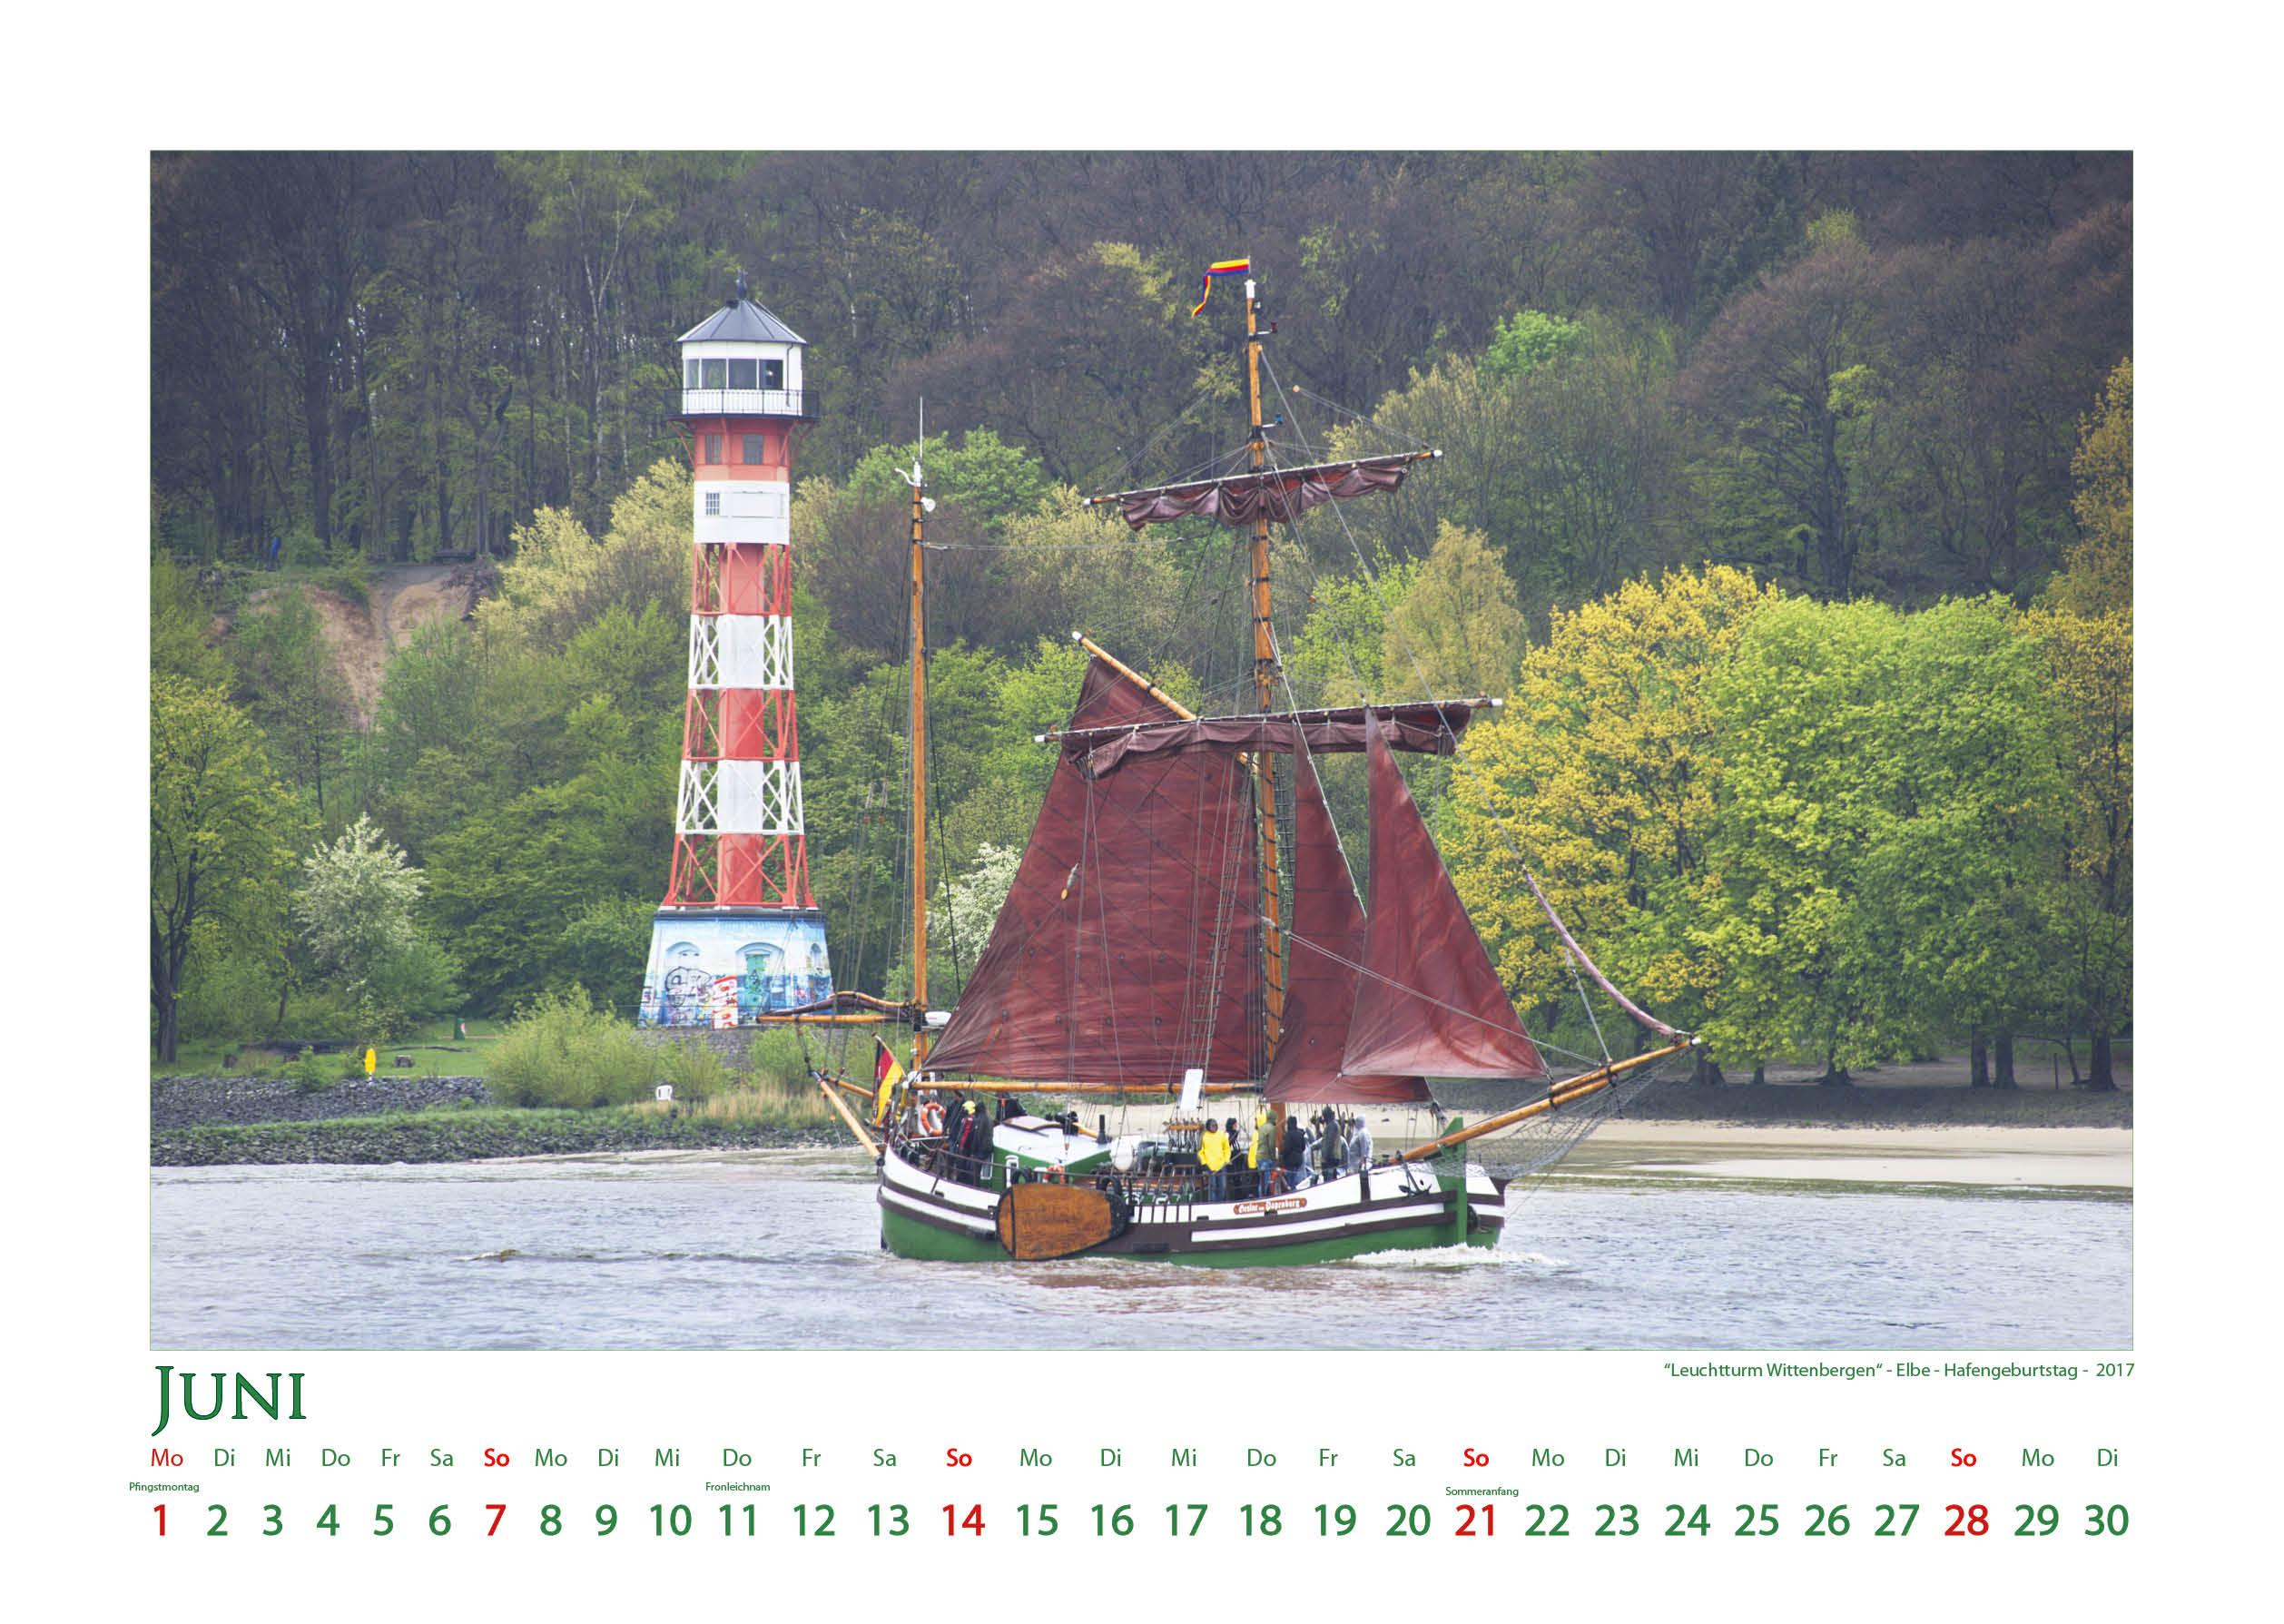 Leuchtturm Wittenbergen - Leuchttürme - Kalender 2020 © Katharina Hansen-Gluschitz